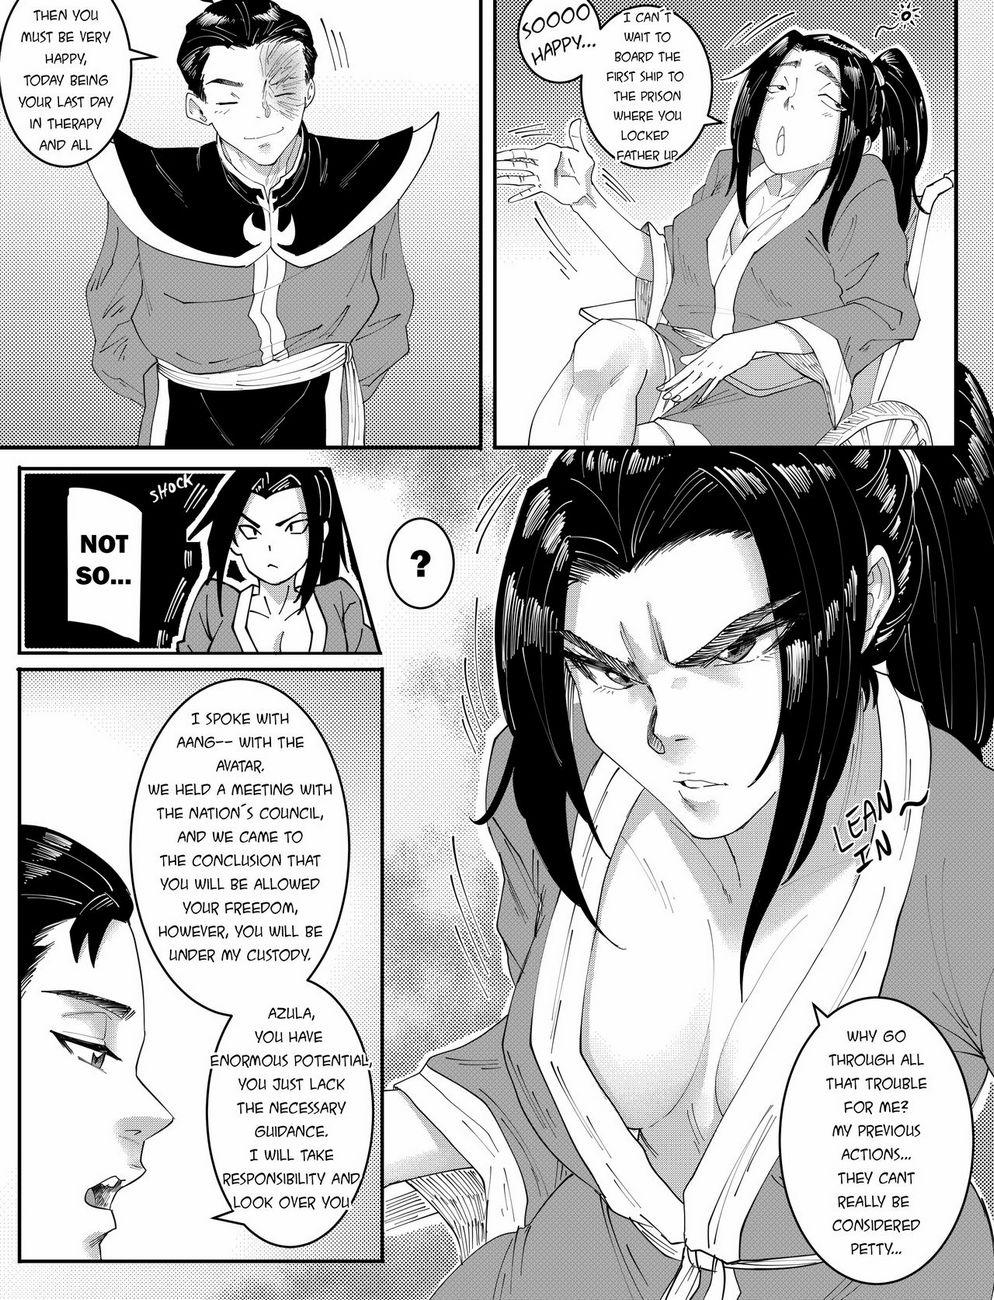 Manga porno i lock you español Rising Heat Comic Porn Hd Porn Comics